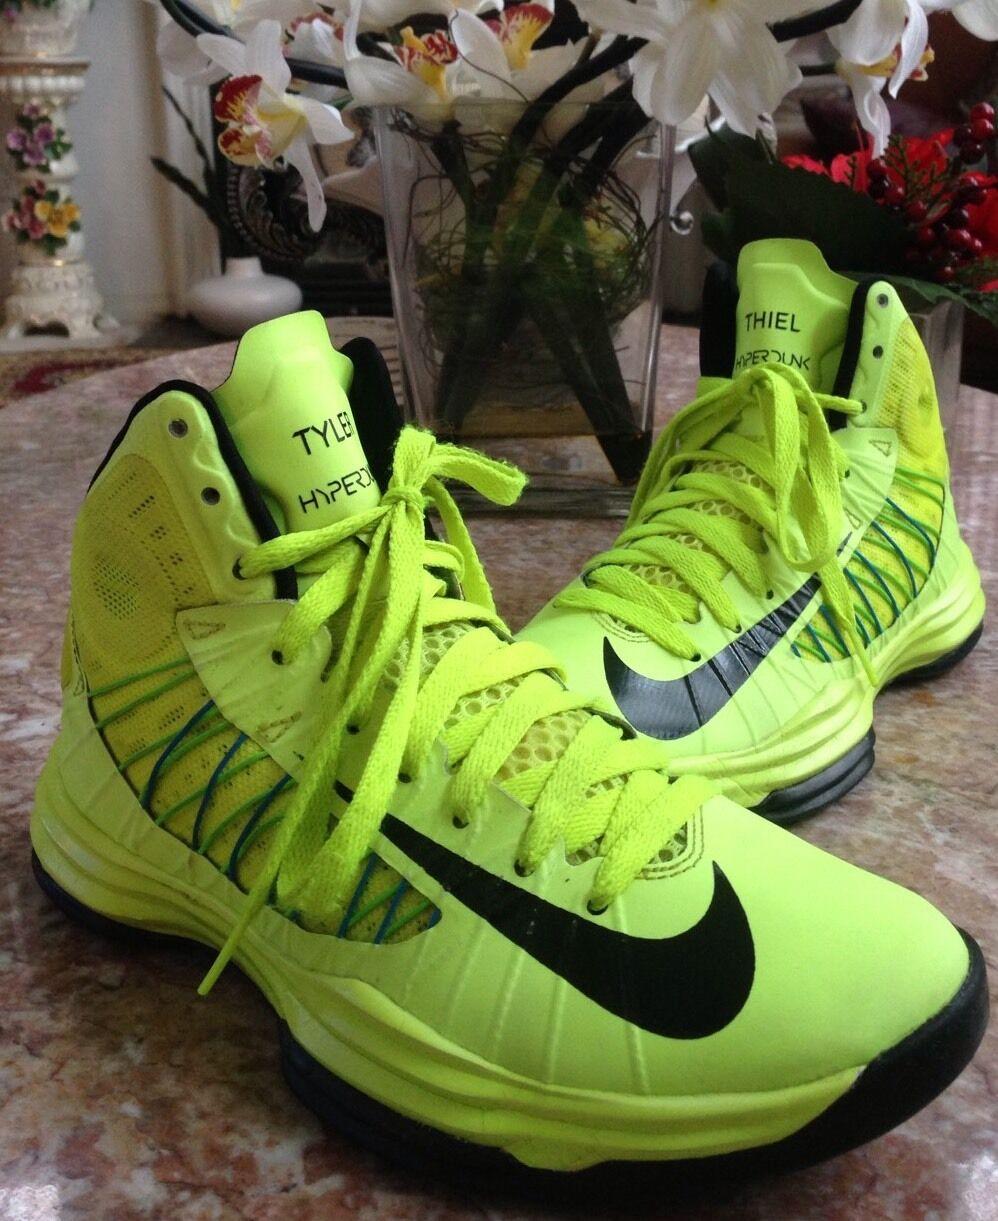 Nike hyperdunk iD Neon Green Black Sneakers Mens Size  6.5 (553201-991) EUC